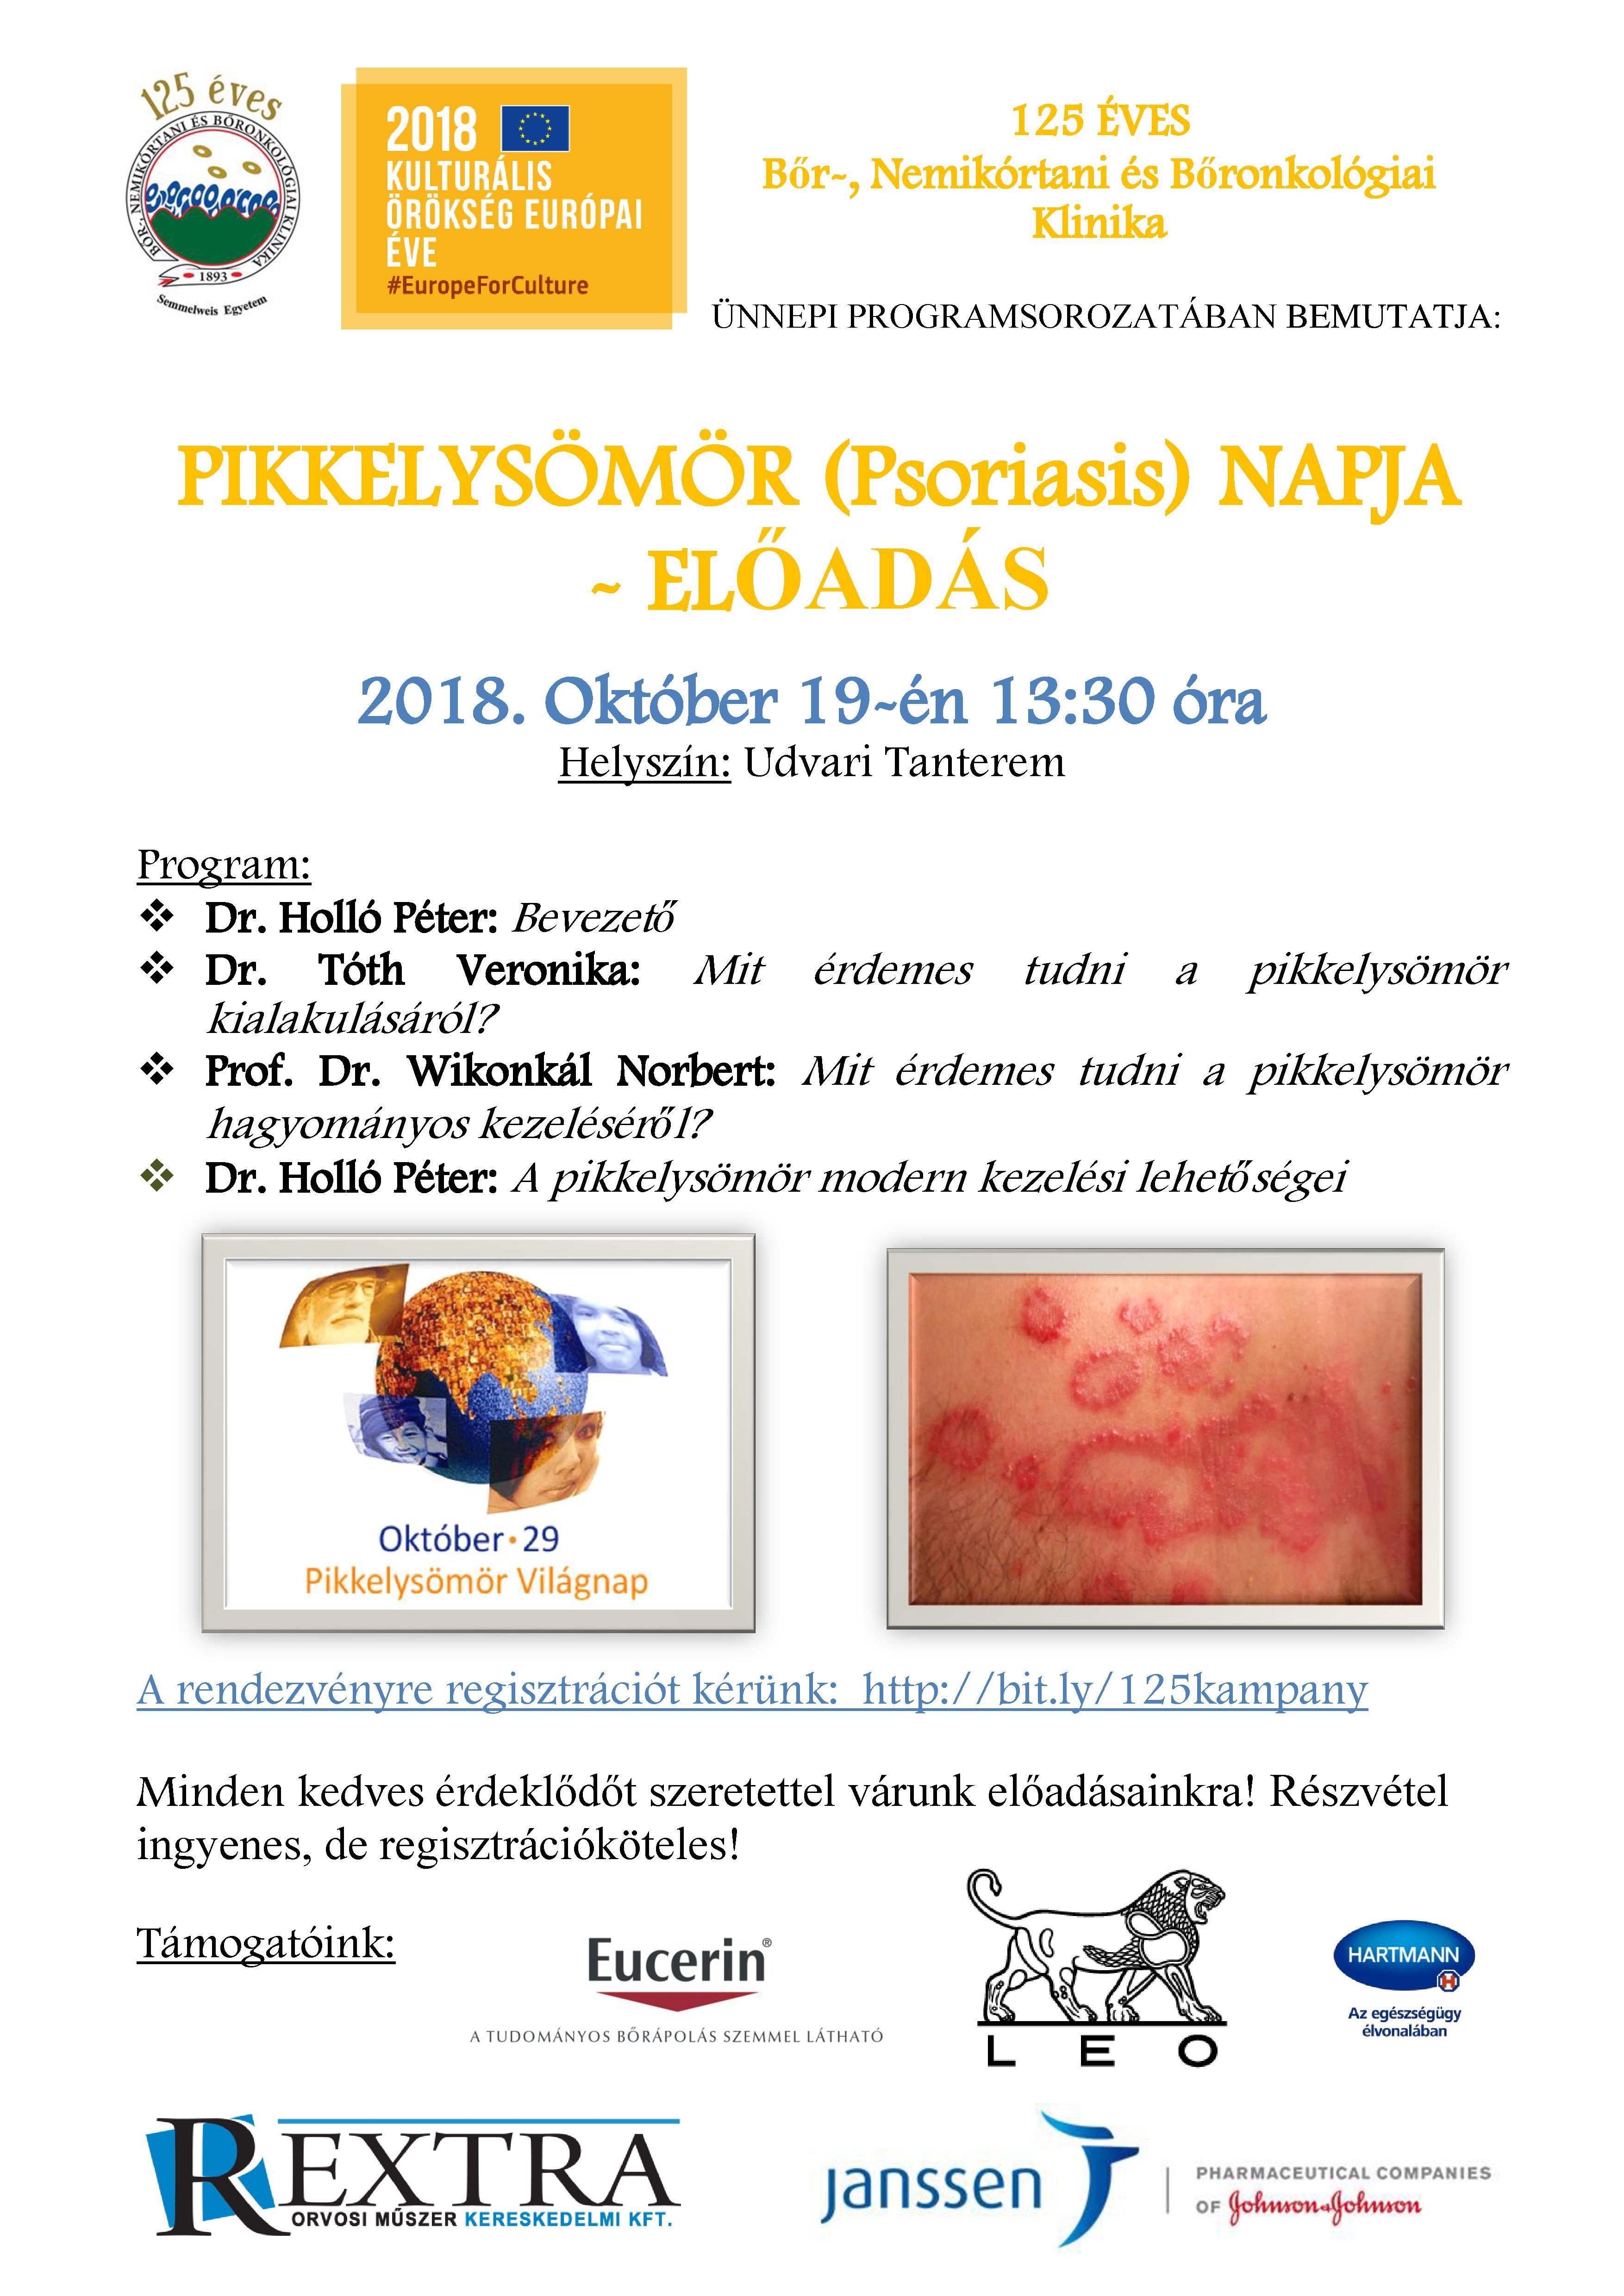 Psoriasis szakrendelés, Biológiai Terápiás Centrum